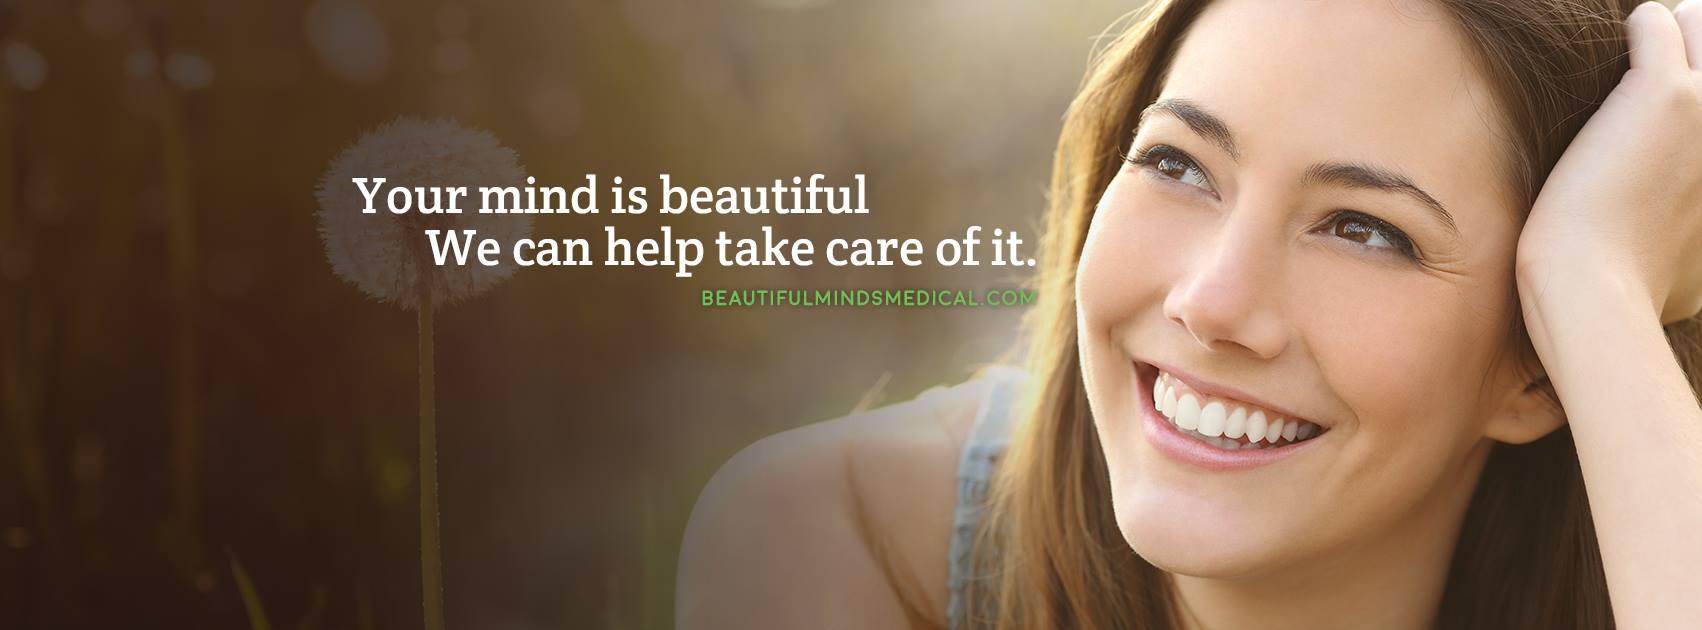 Beautiful Minds Medical, Inc.